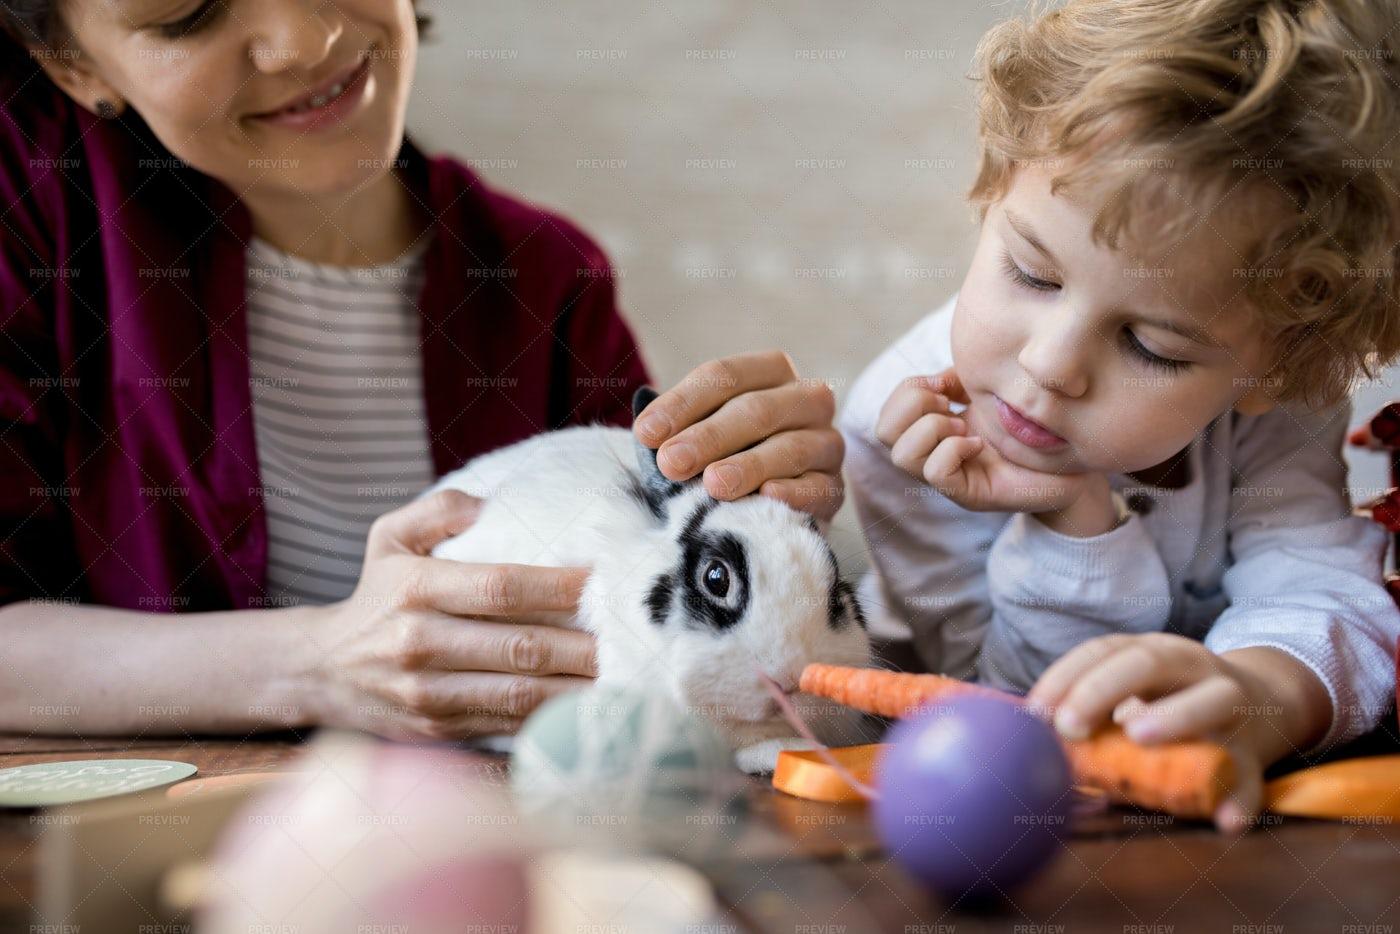 Little Boy Feeding Pet Bunny: Stock Photos